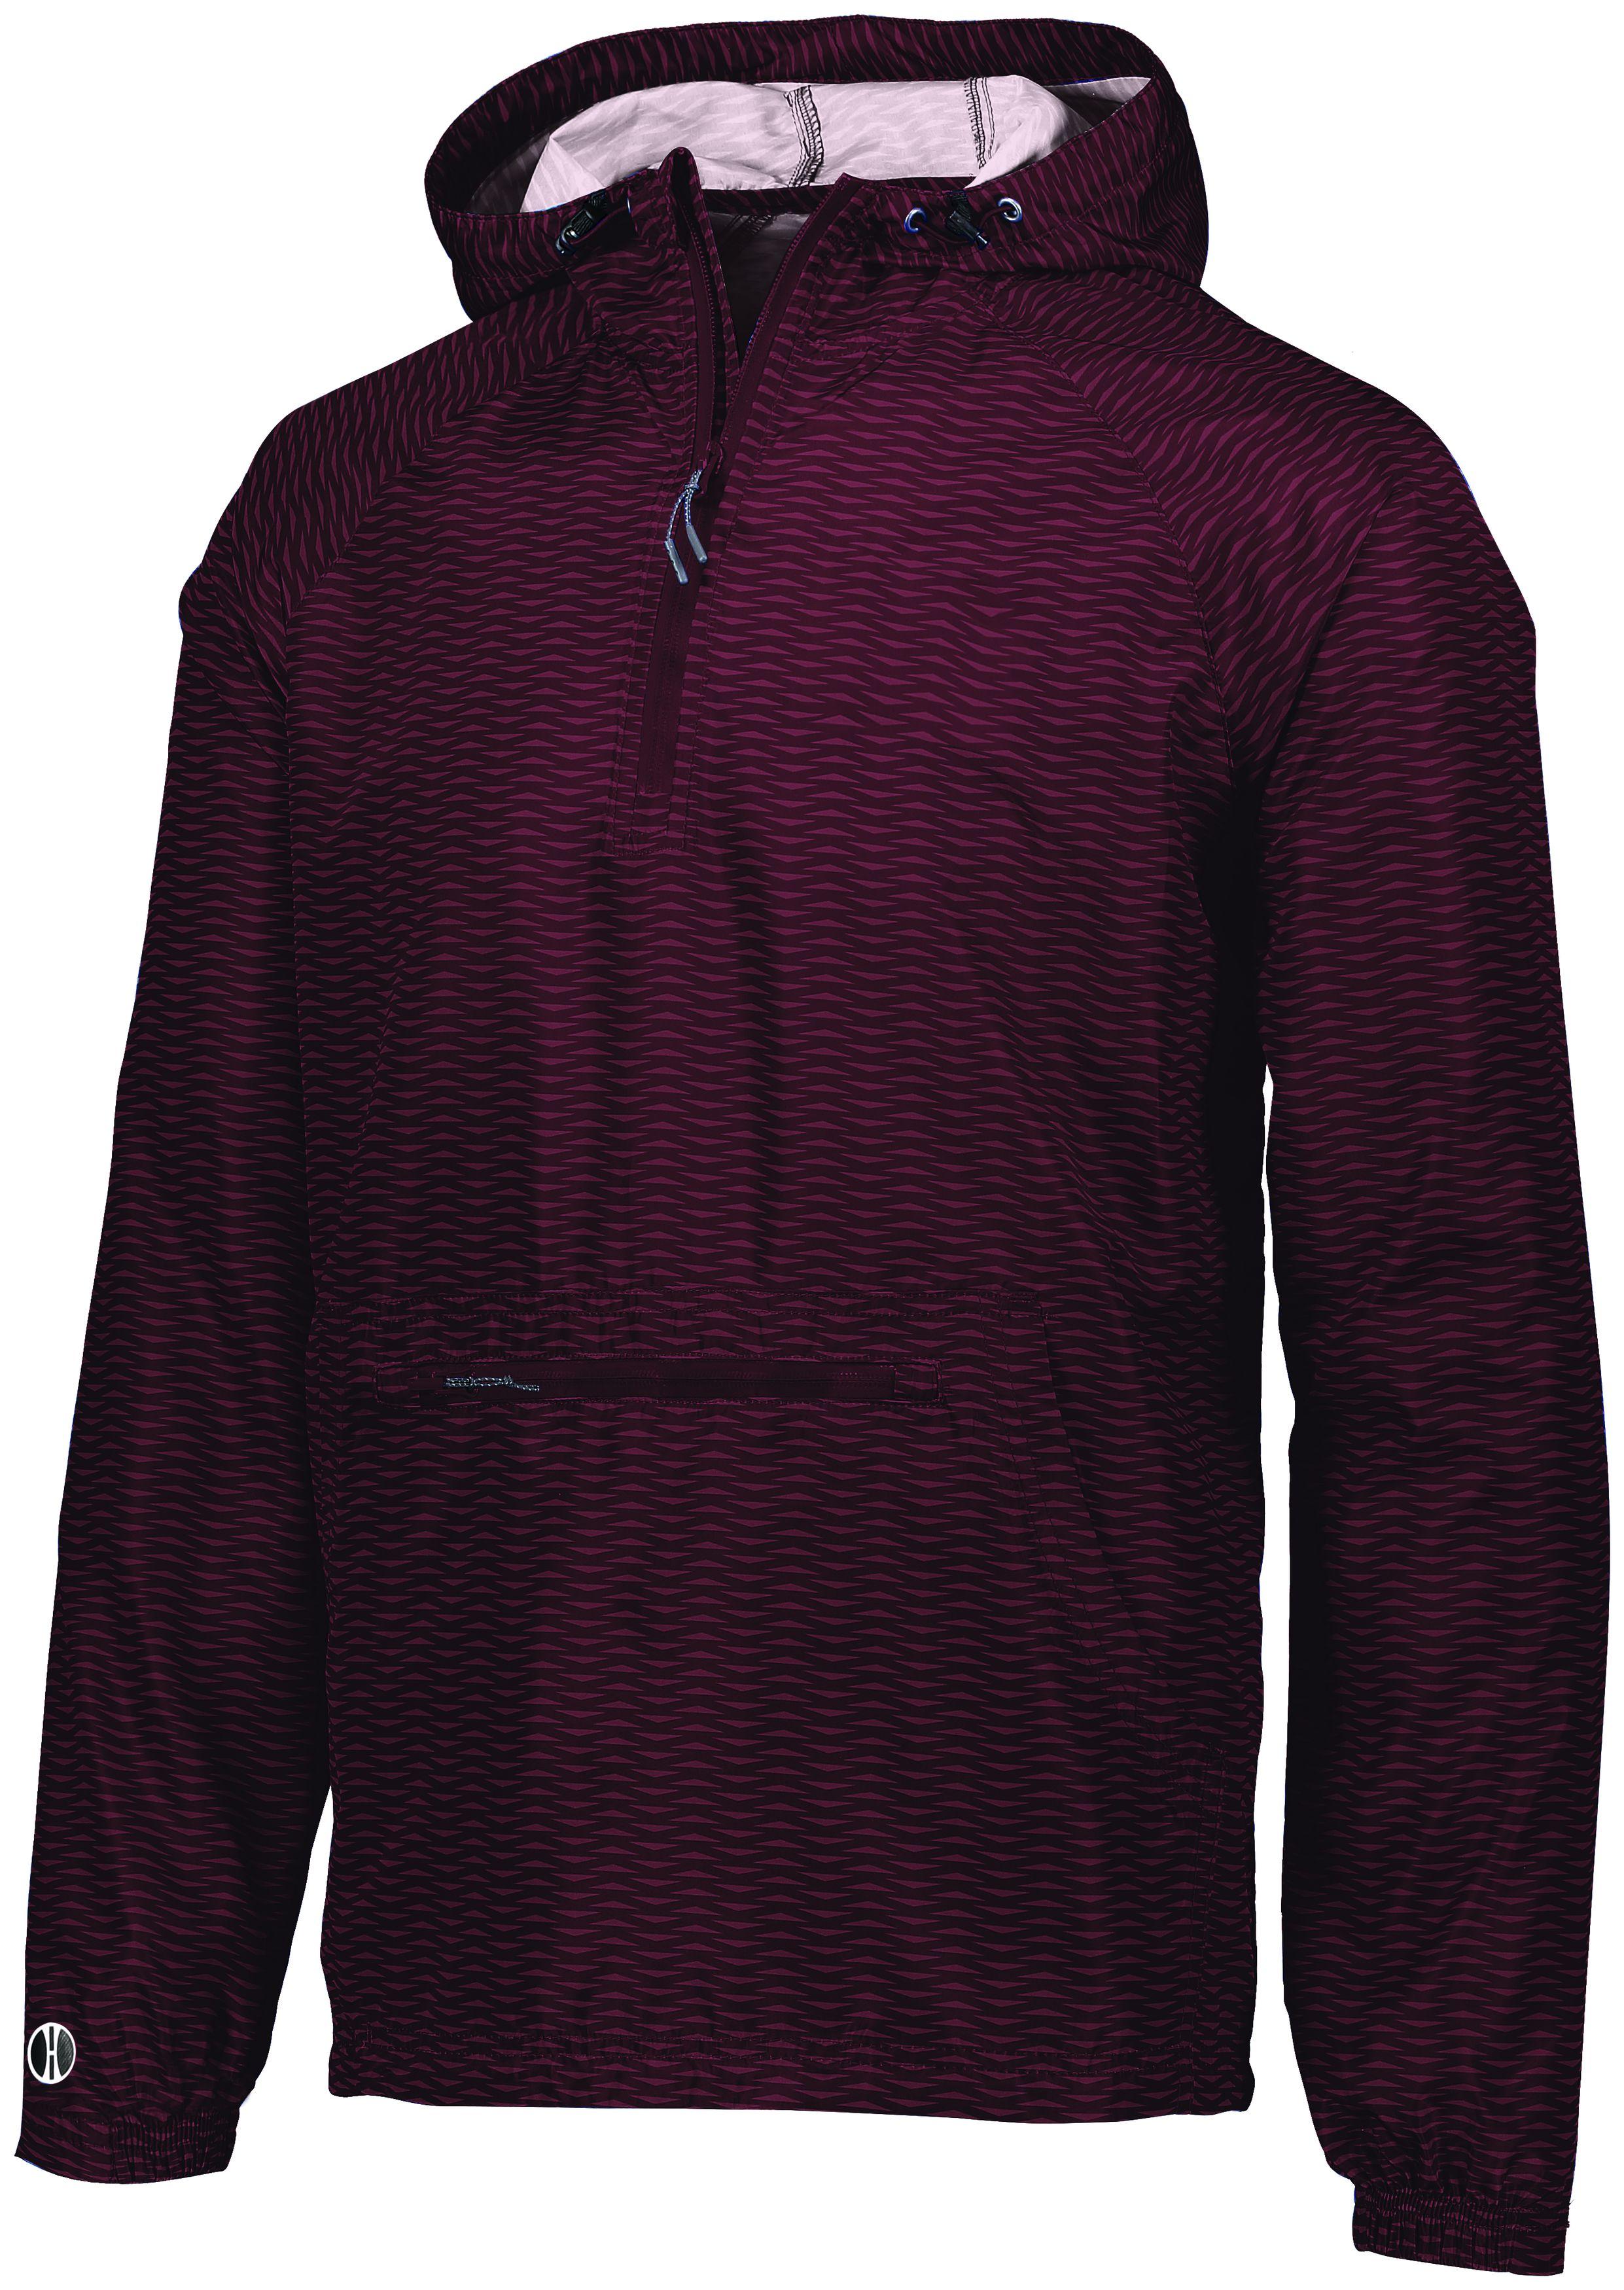 Range Packable Pullover - MAROON